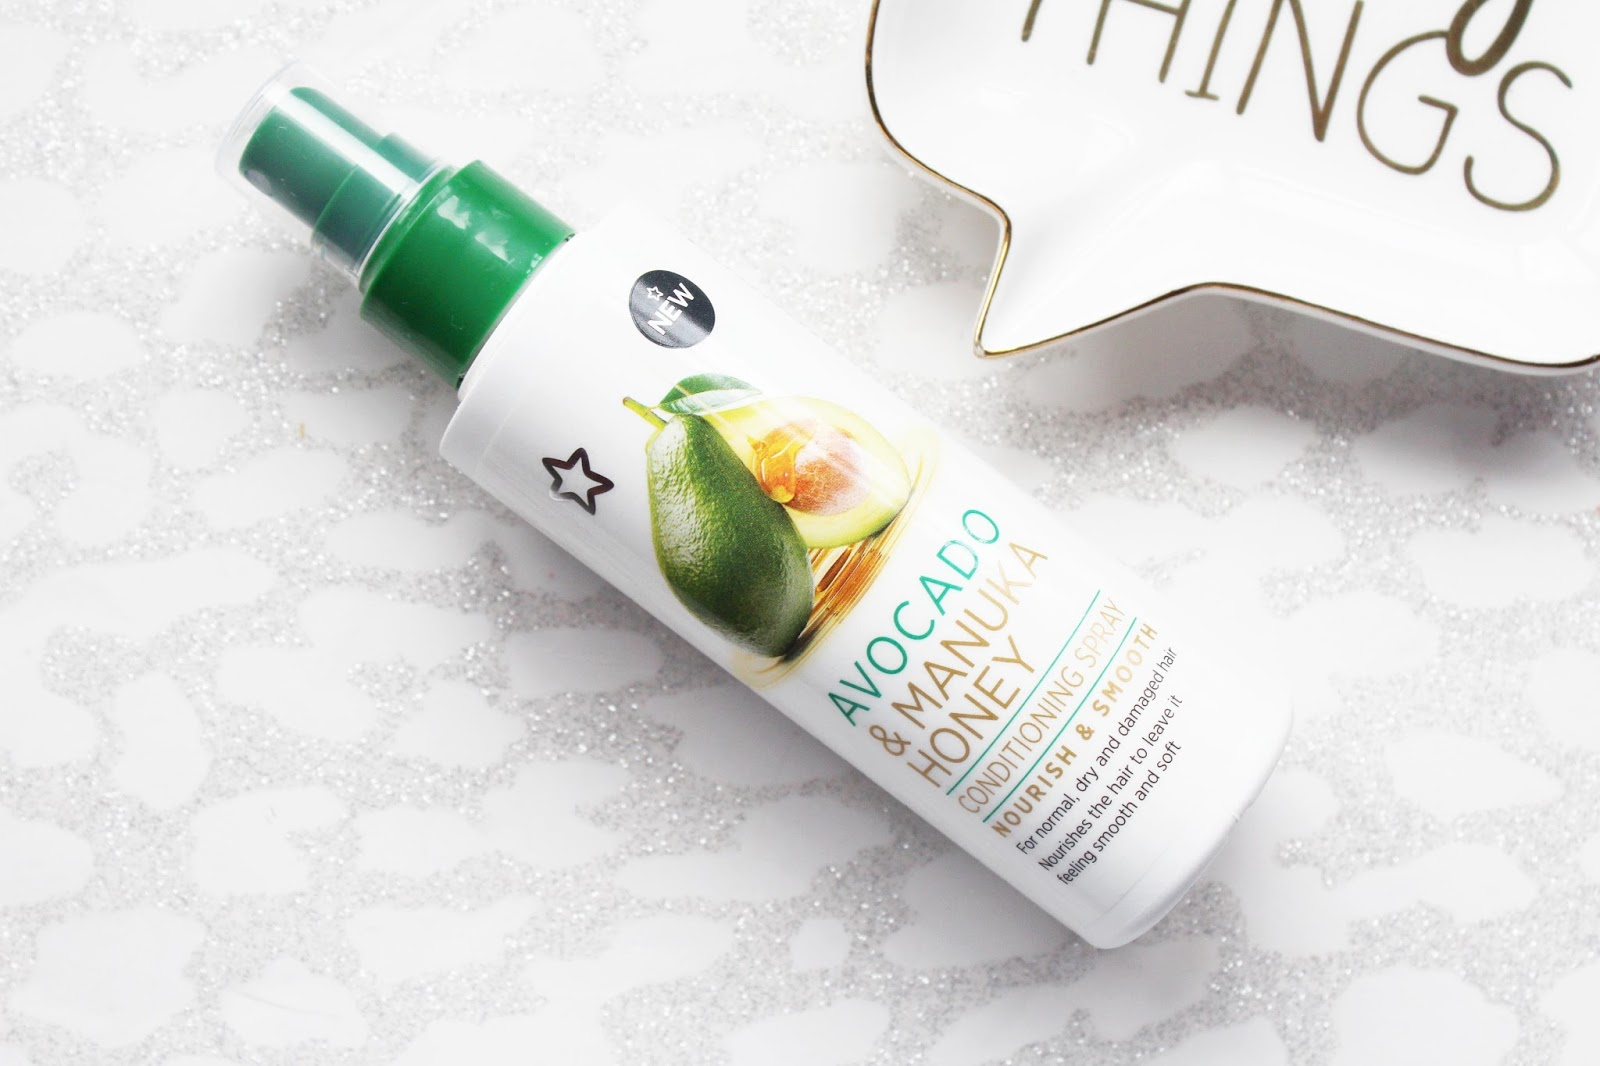 Superdrug Avocado & Manuka Honey Hair Care